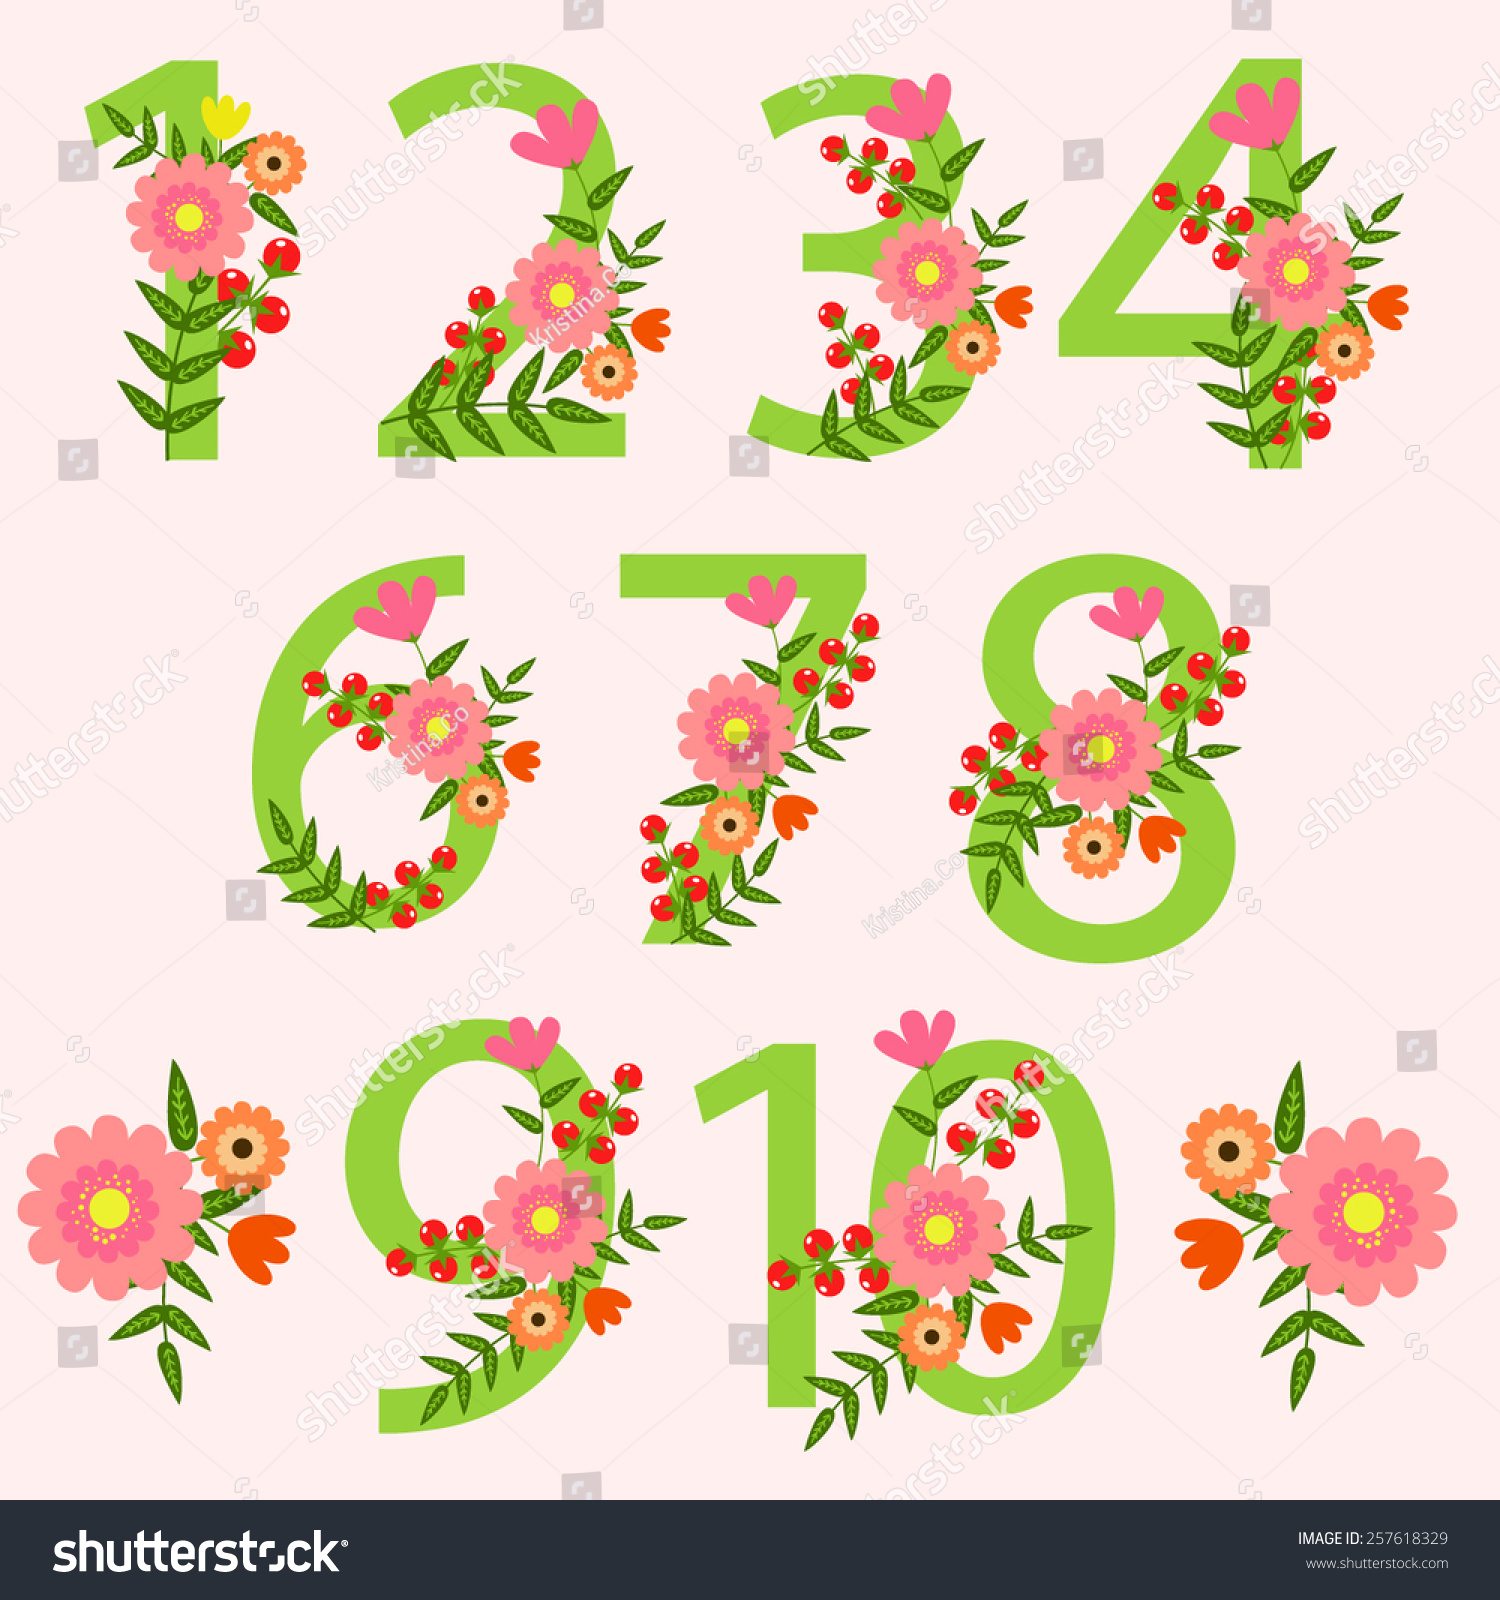 Wedding Floral Number Wedding Clipart Wedding Stock Vector HD ...